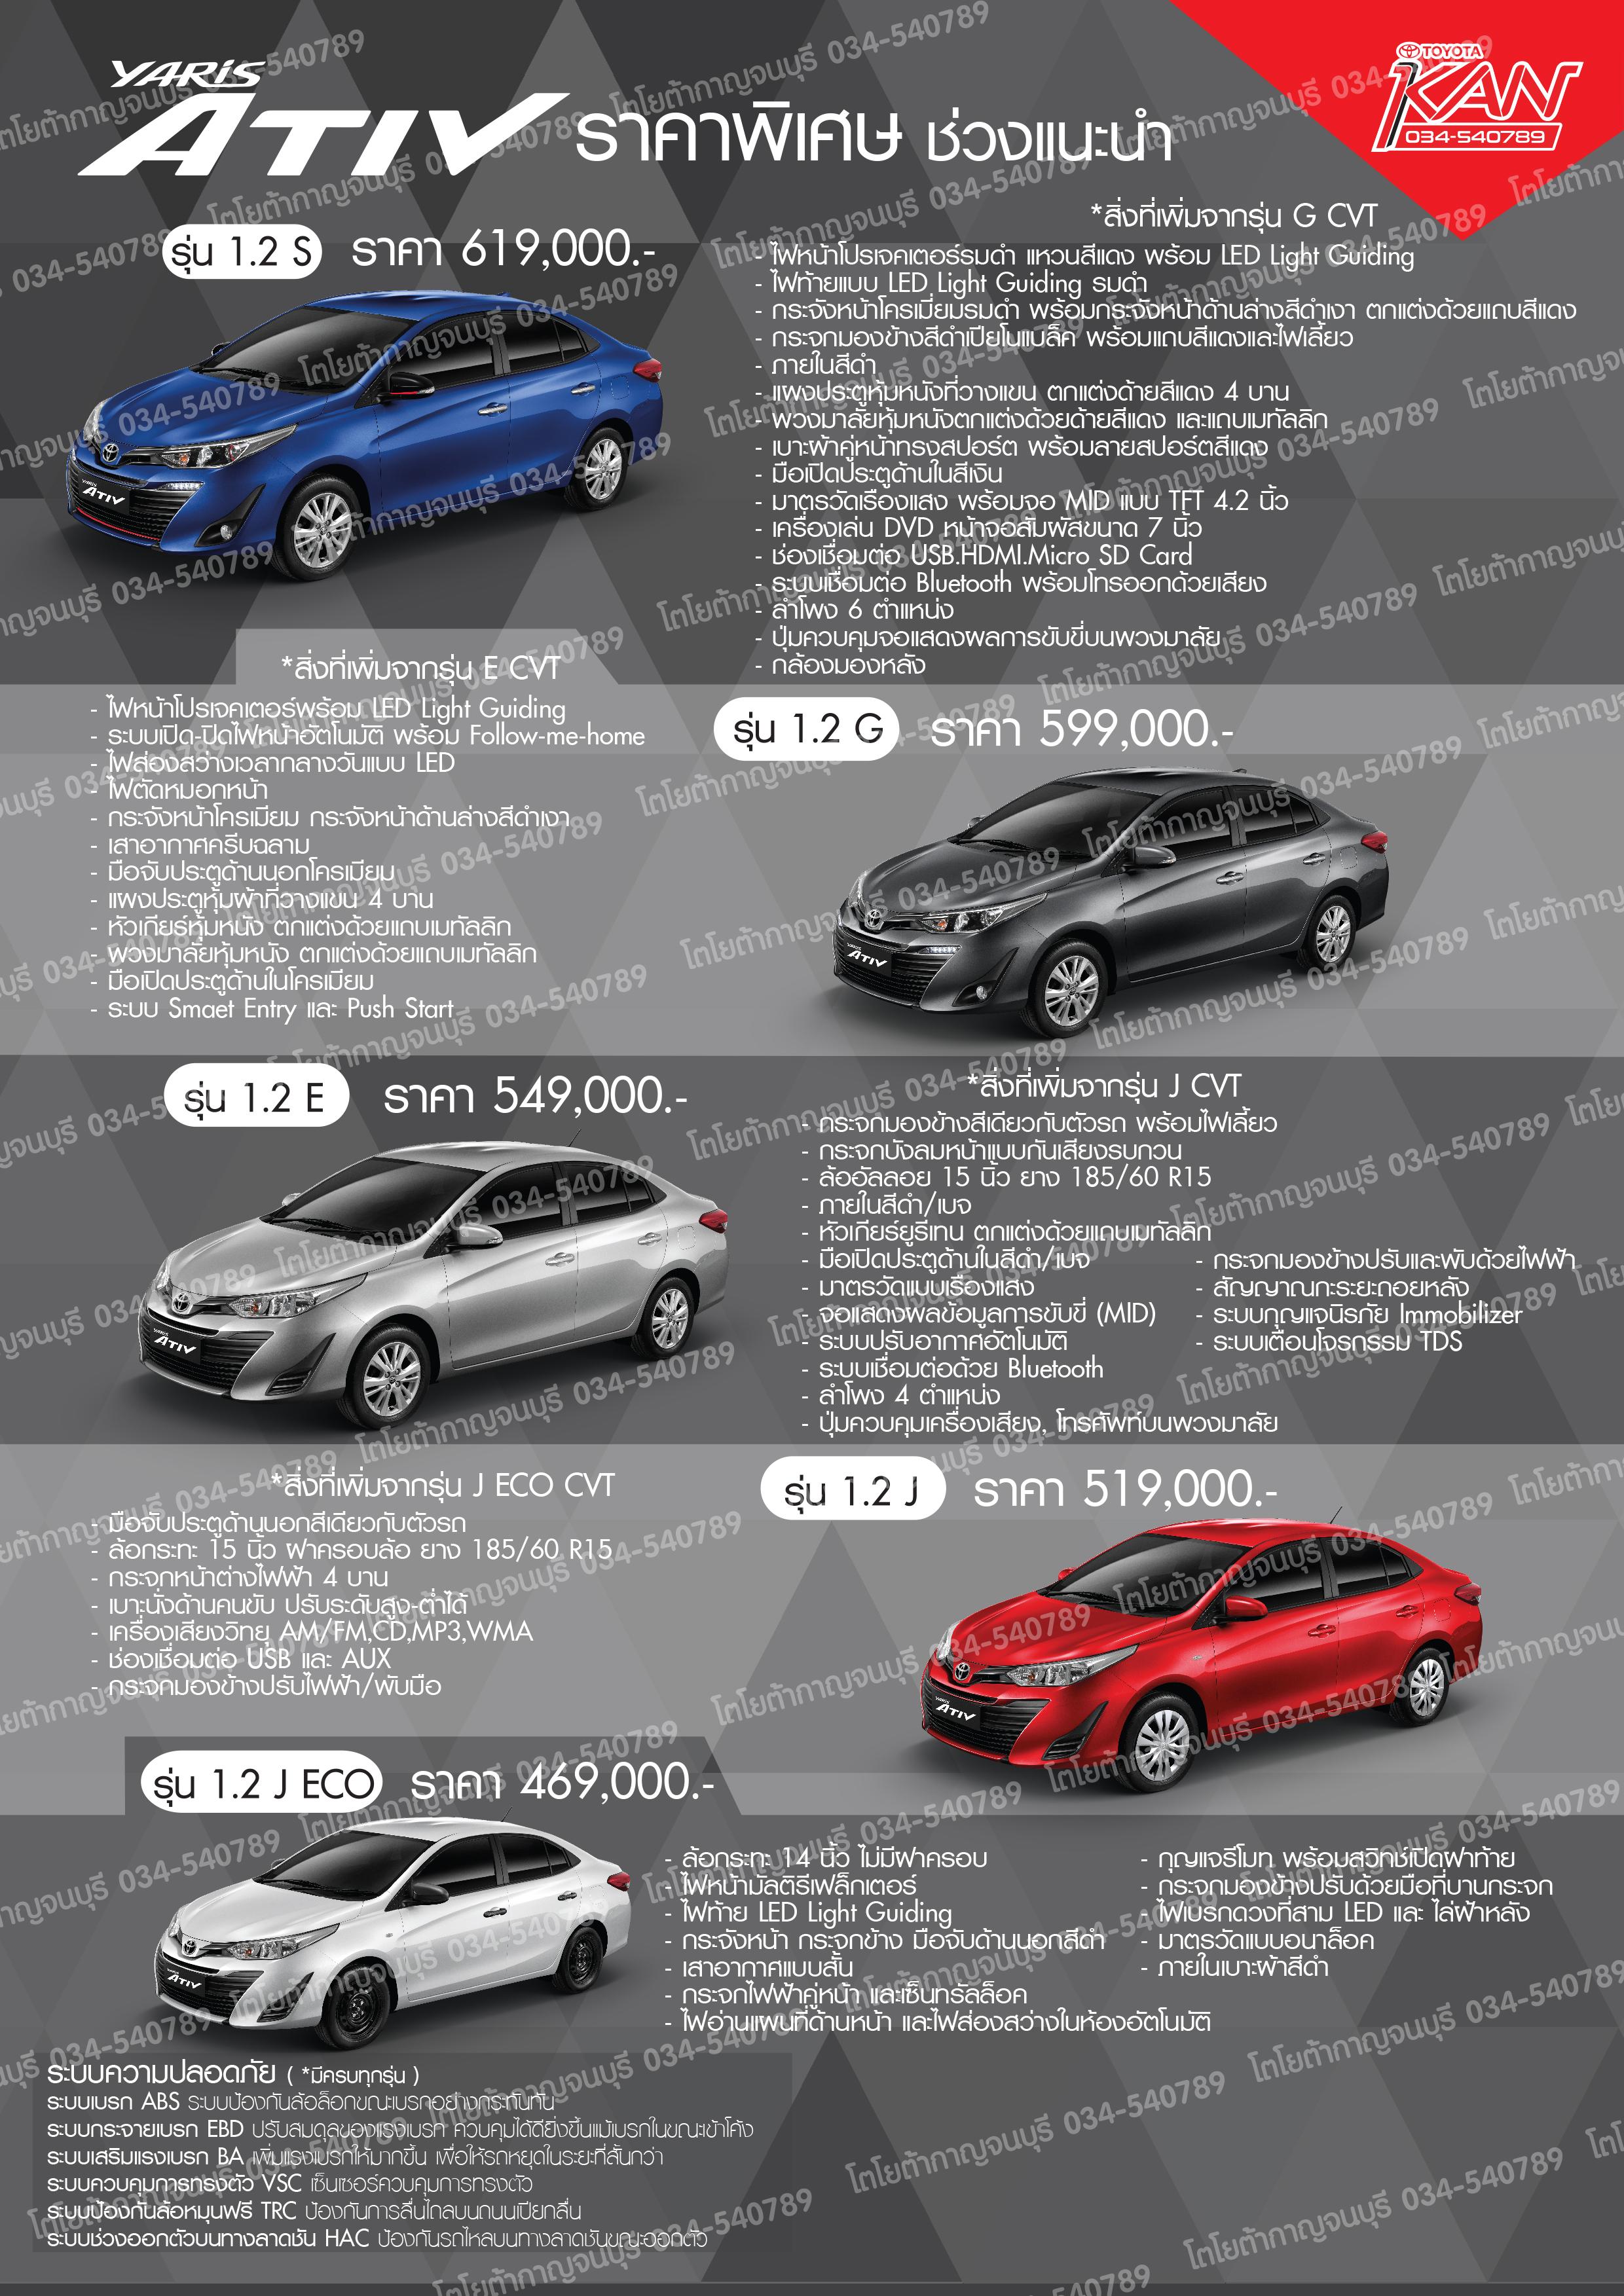 yaris-ลายน้ำ รีวิว Yaris ATIV Eco Car น้องใหม่ Option จัดเต็ม